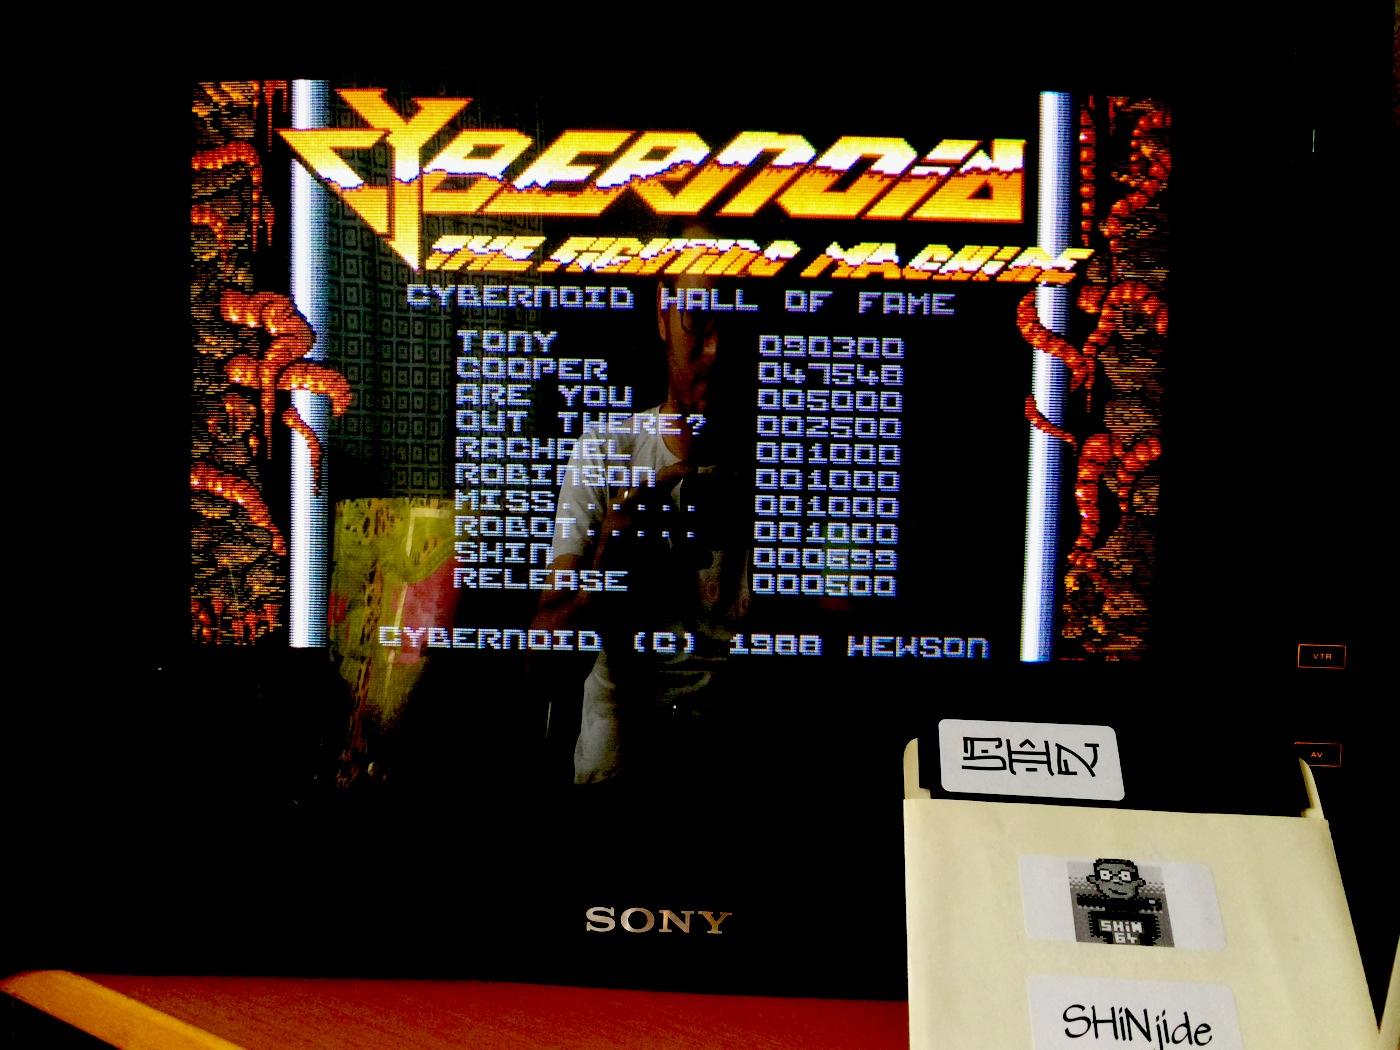 SHiNjide: Cybernoid (Amiga) 699 points on 2014-07-02 08:10:42